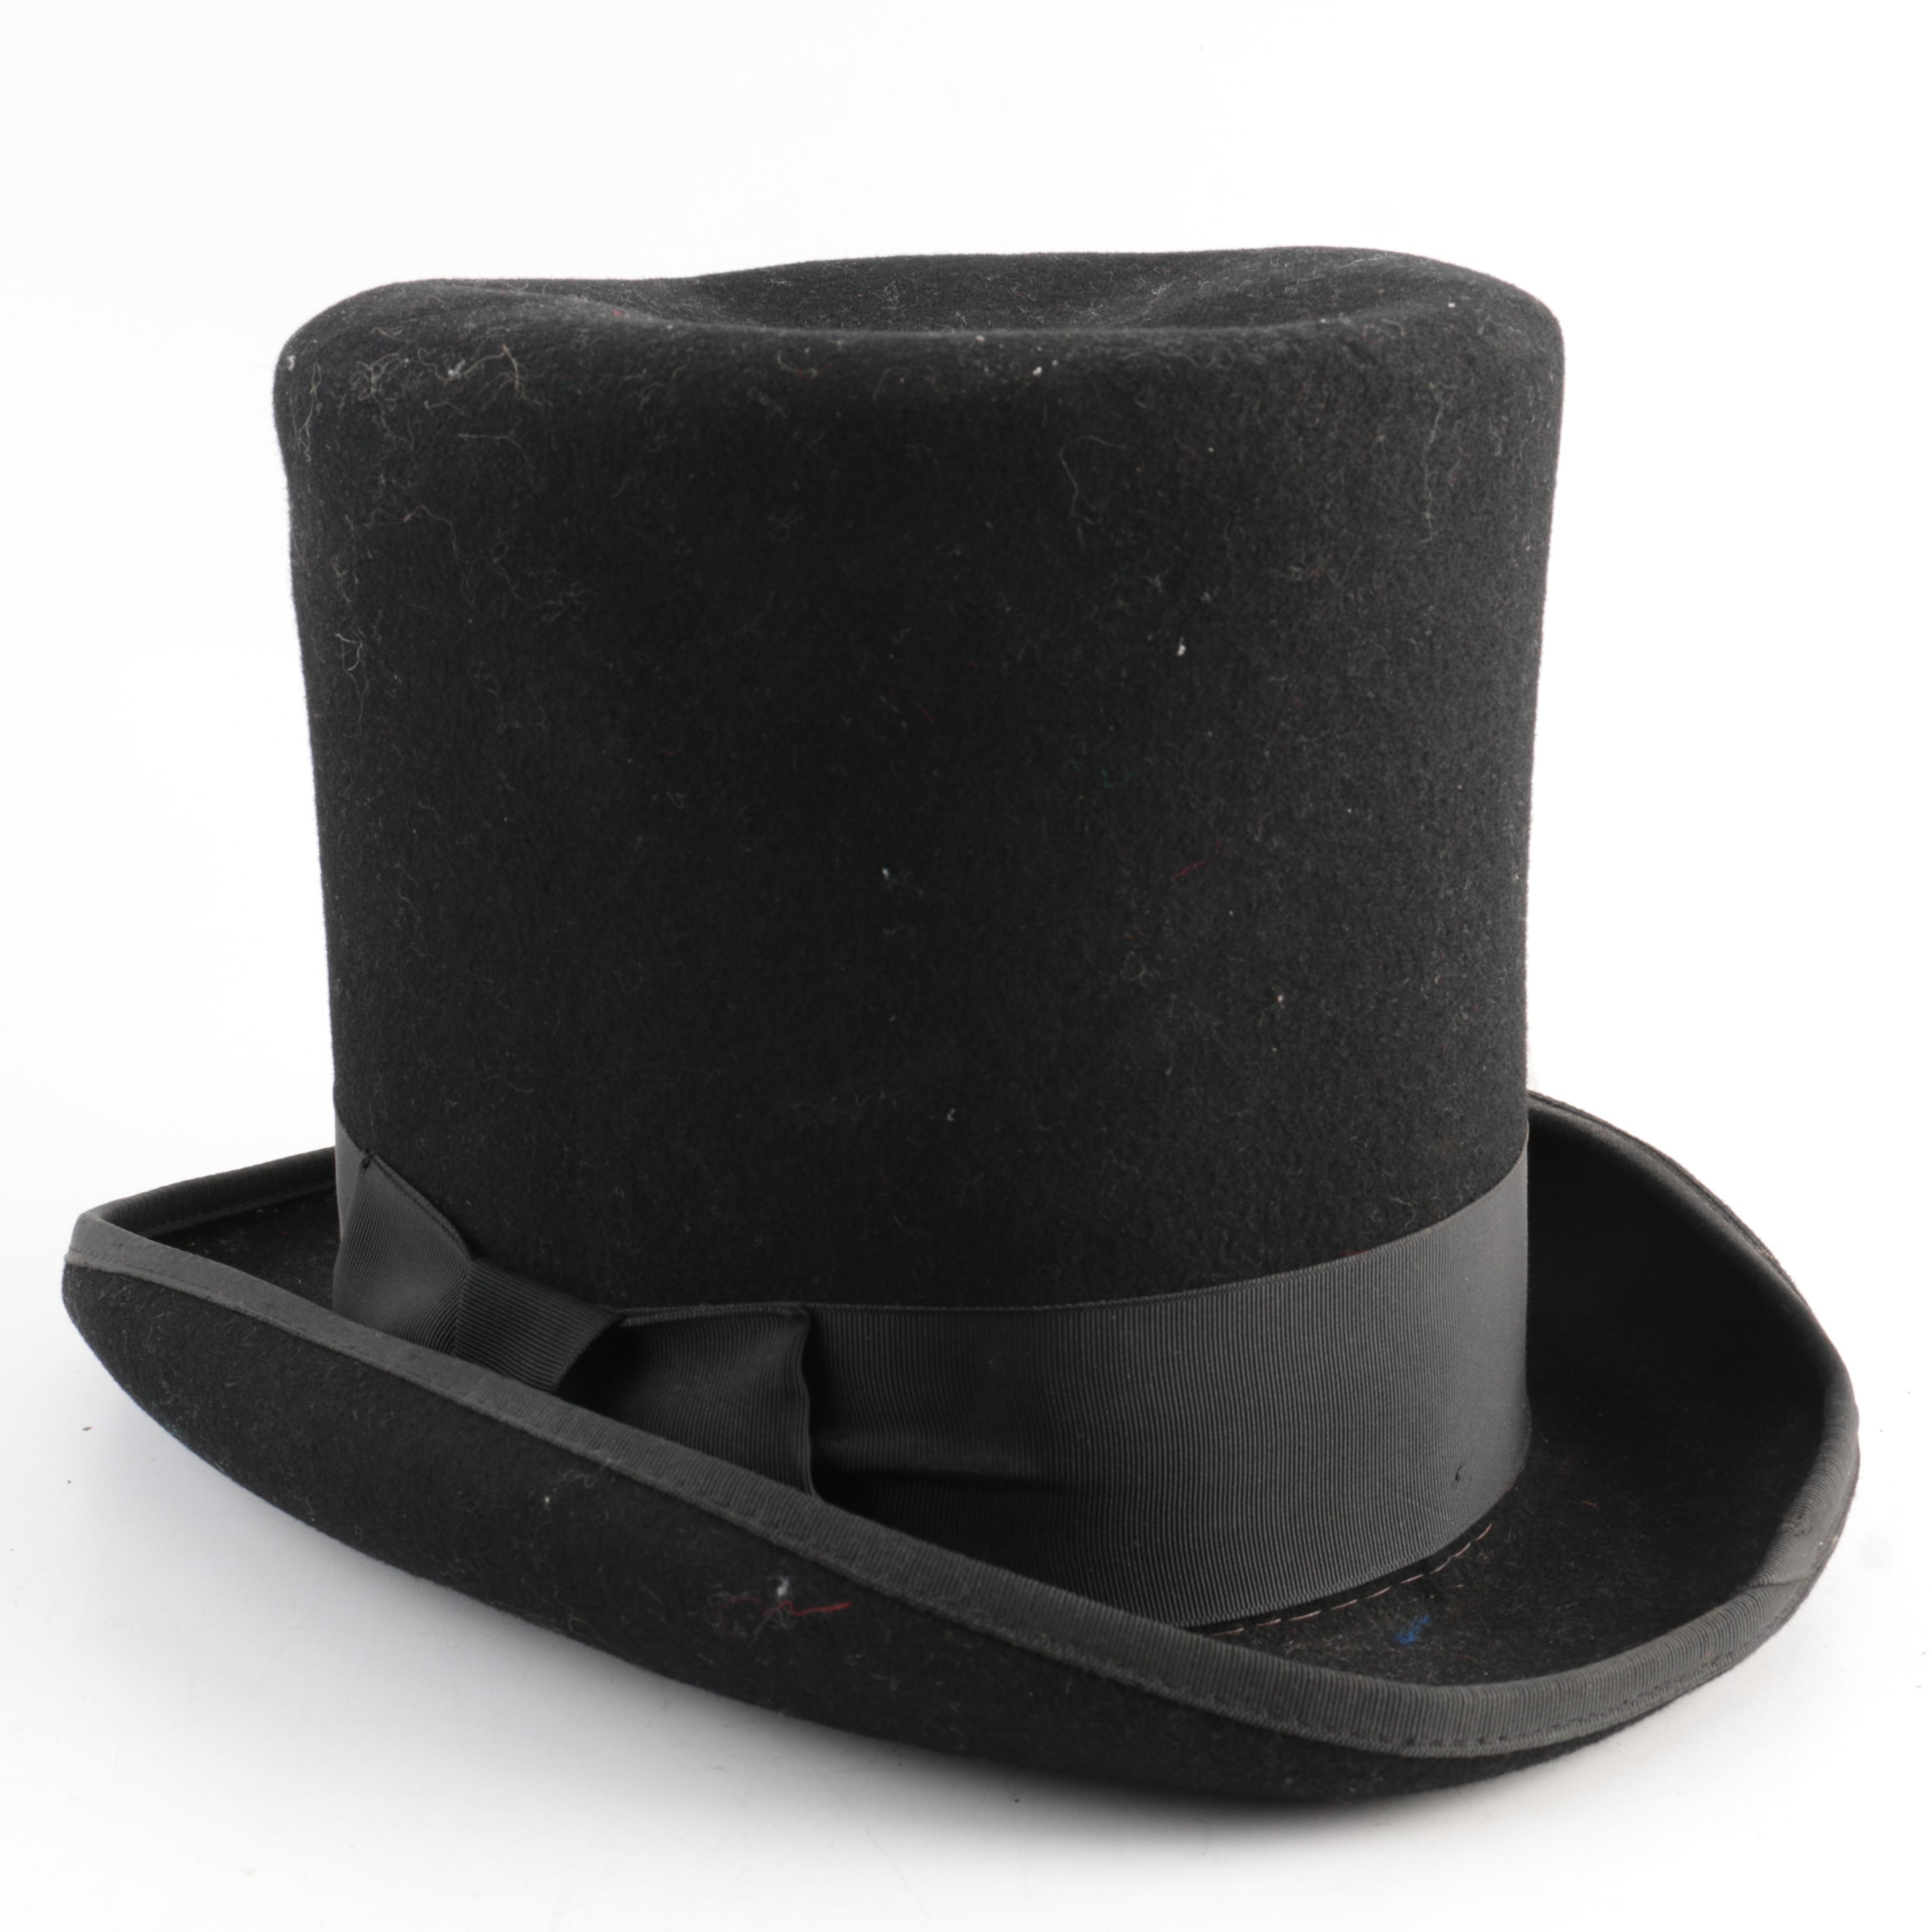 Vintage Madhatters Black Felt Top Hat